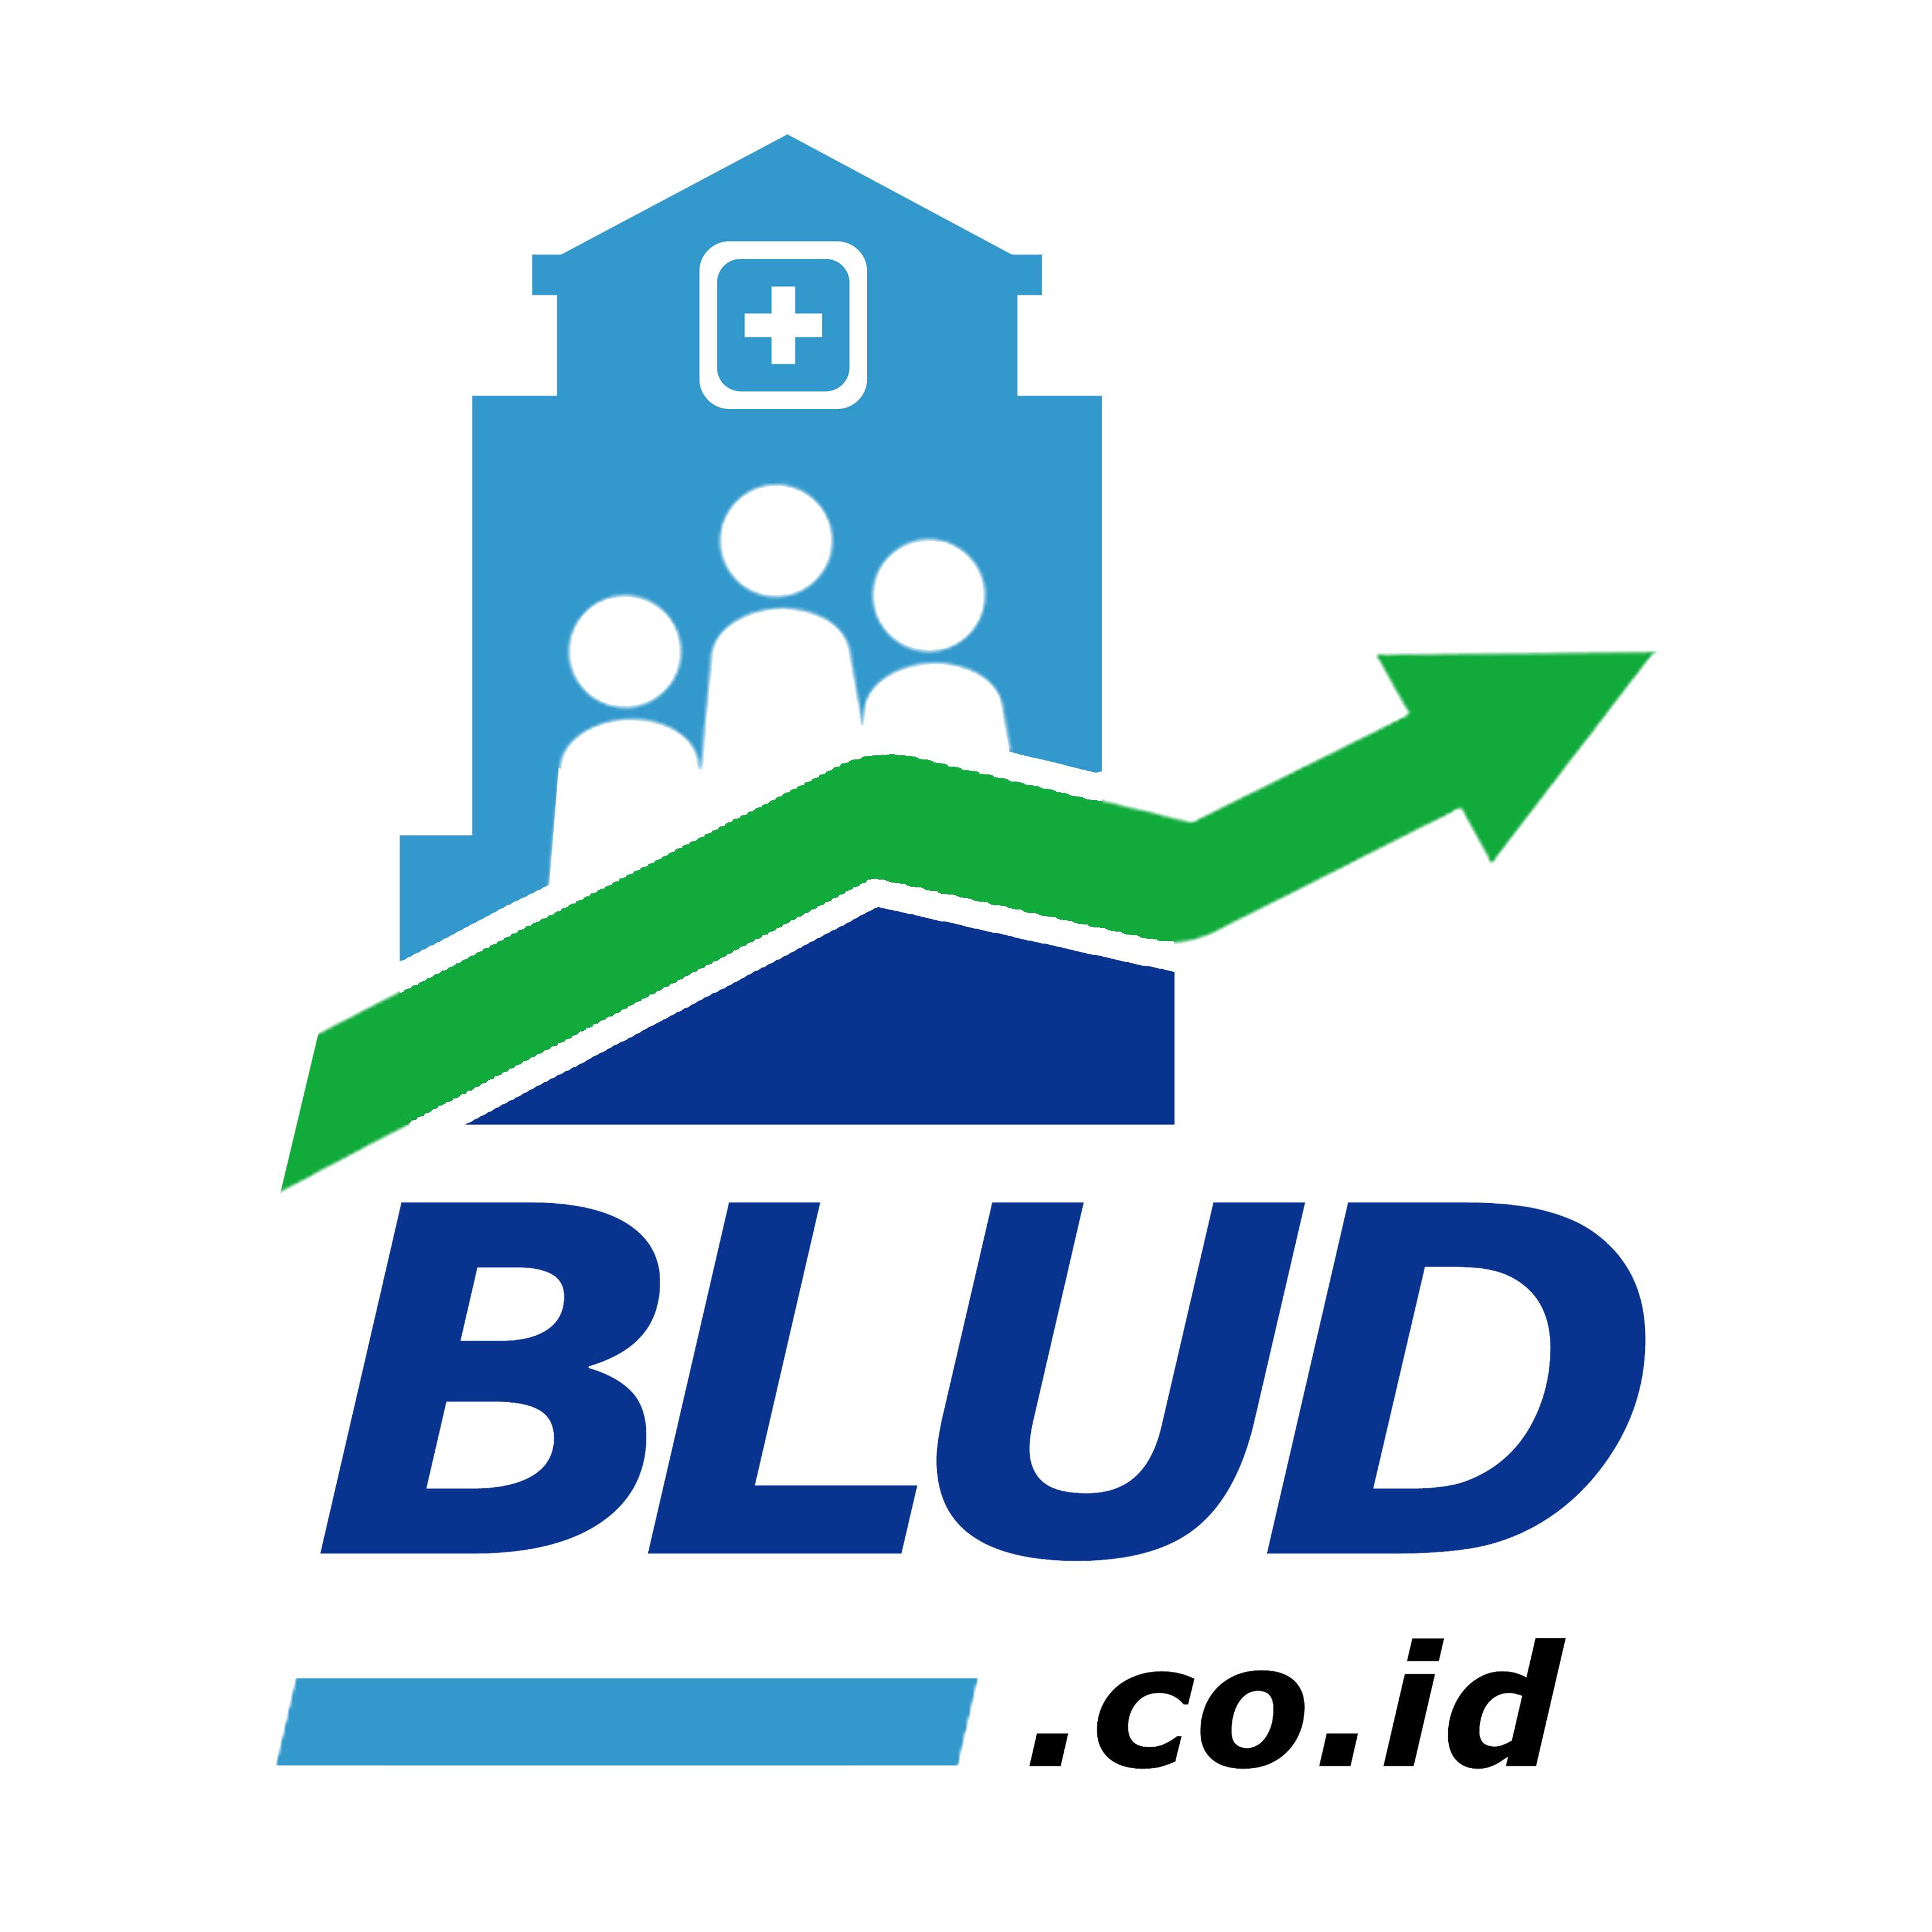 BLUD.co.id